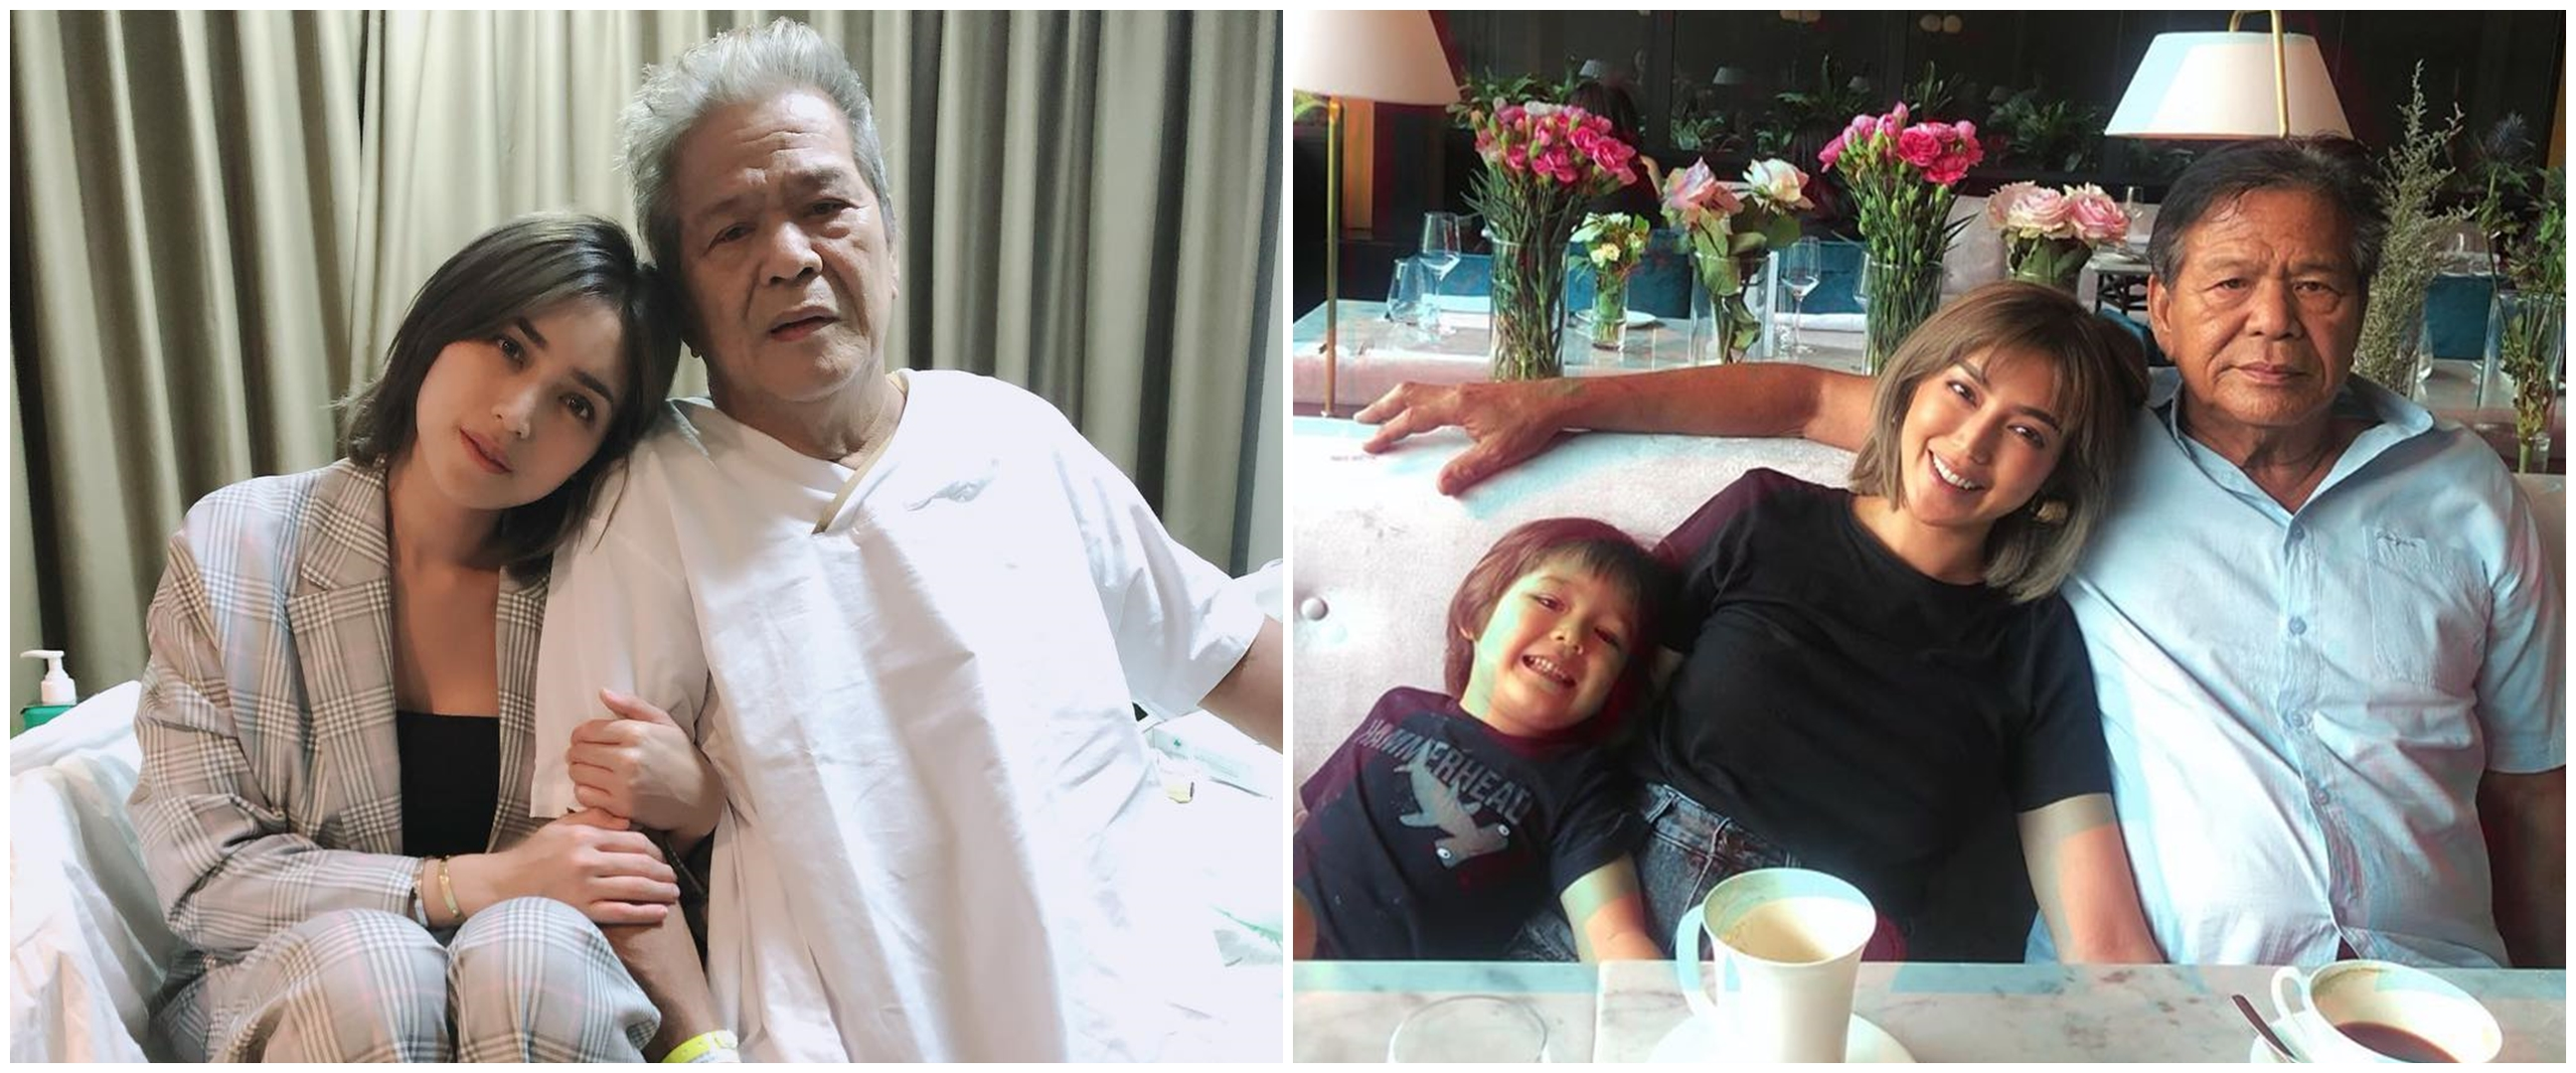 Jarang tersorot, ini 6 potret kedekatan Jessica Iskandar dan ayahnya